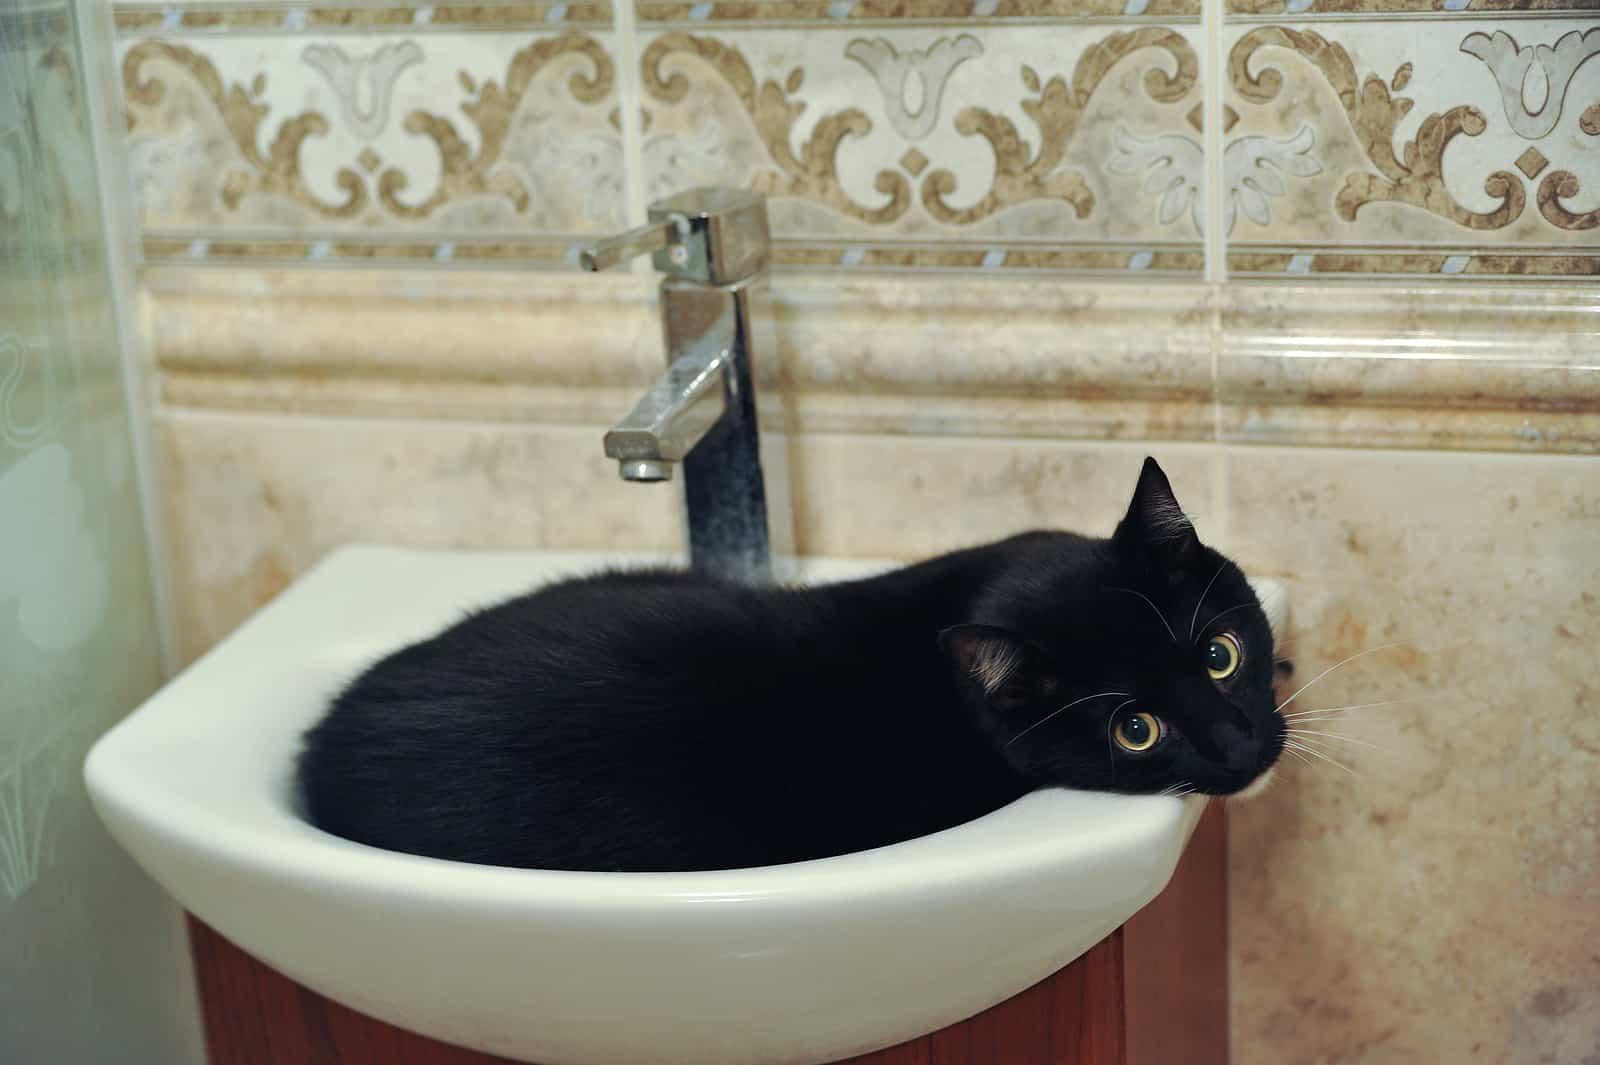 why do cats like to sleep in sinks